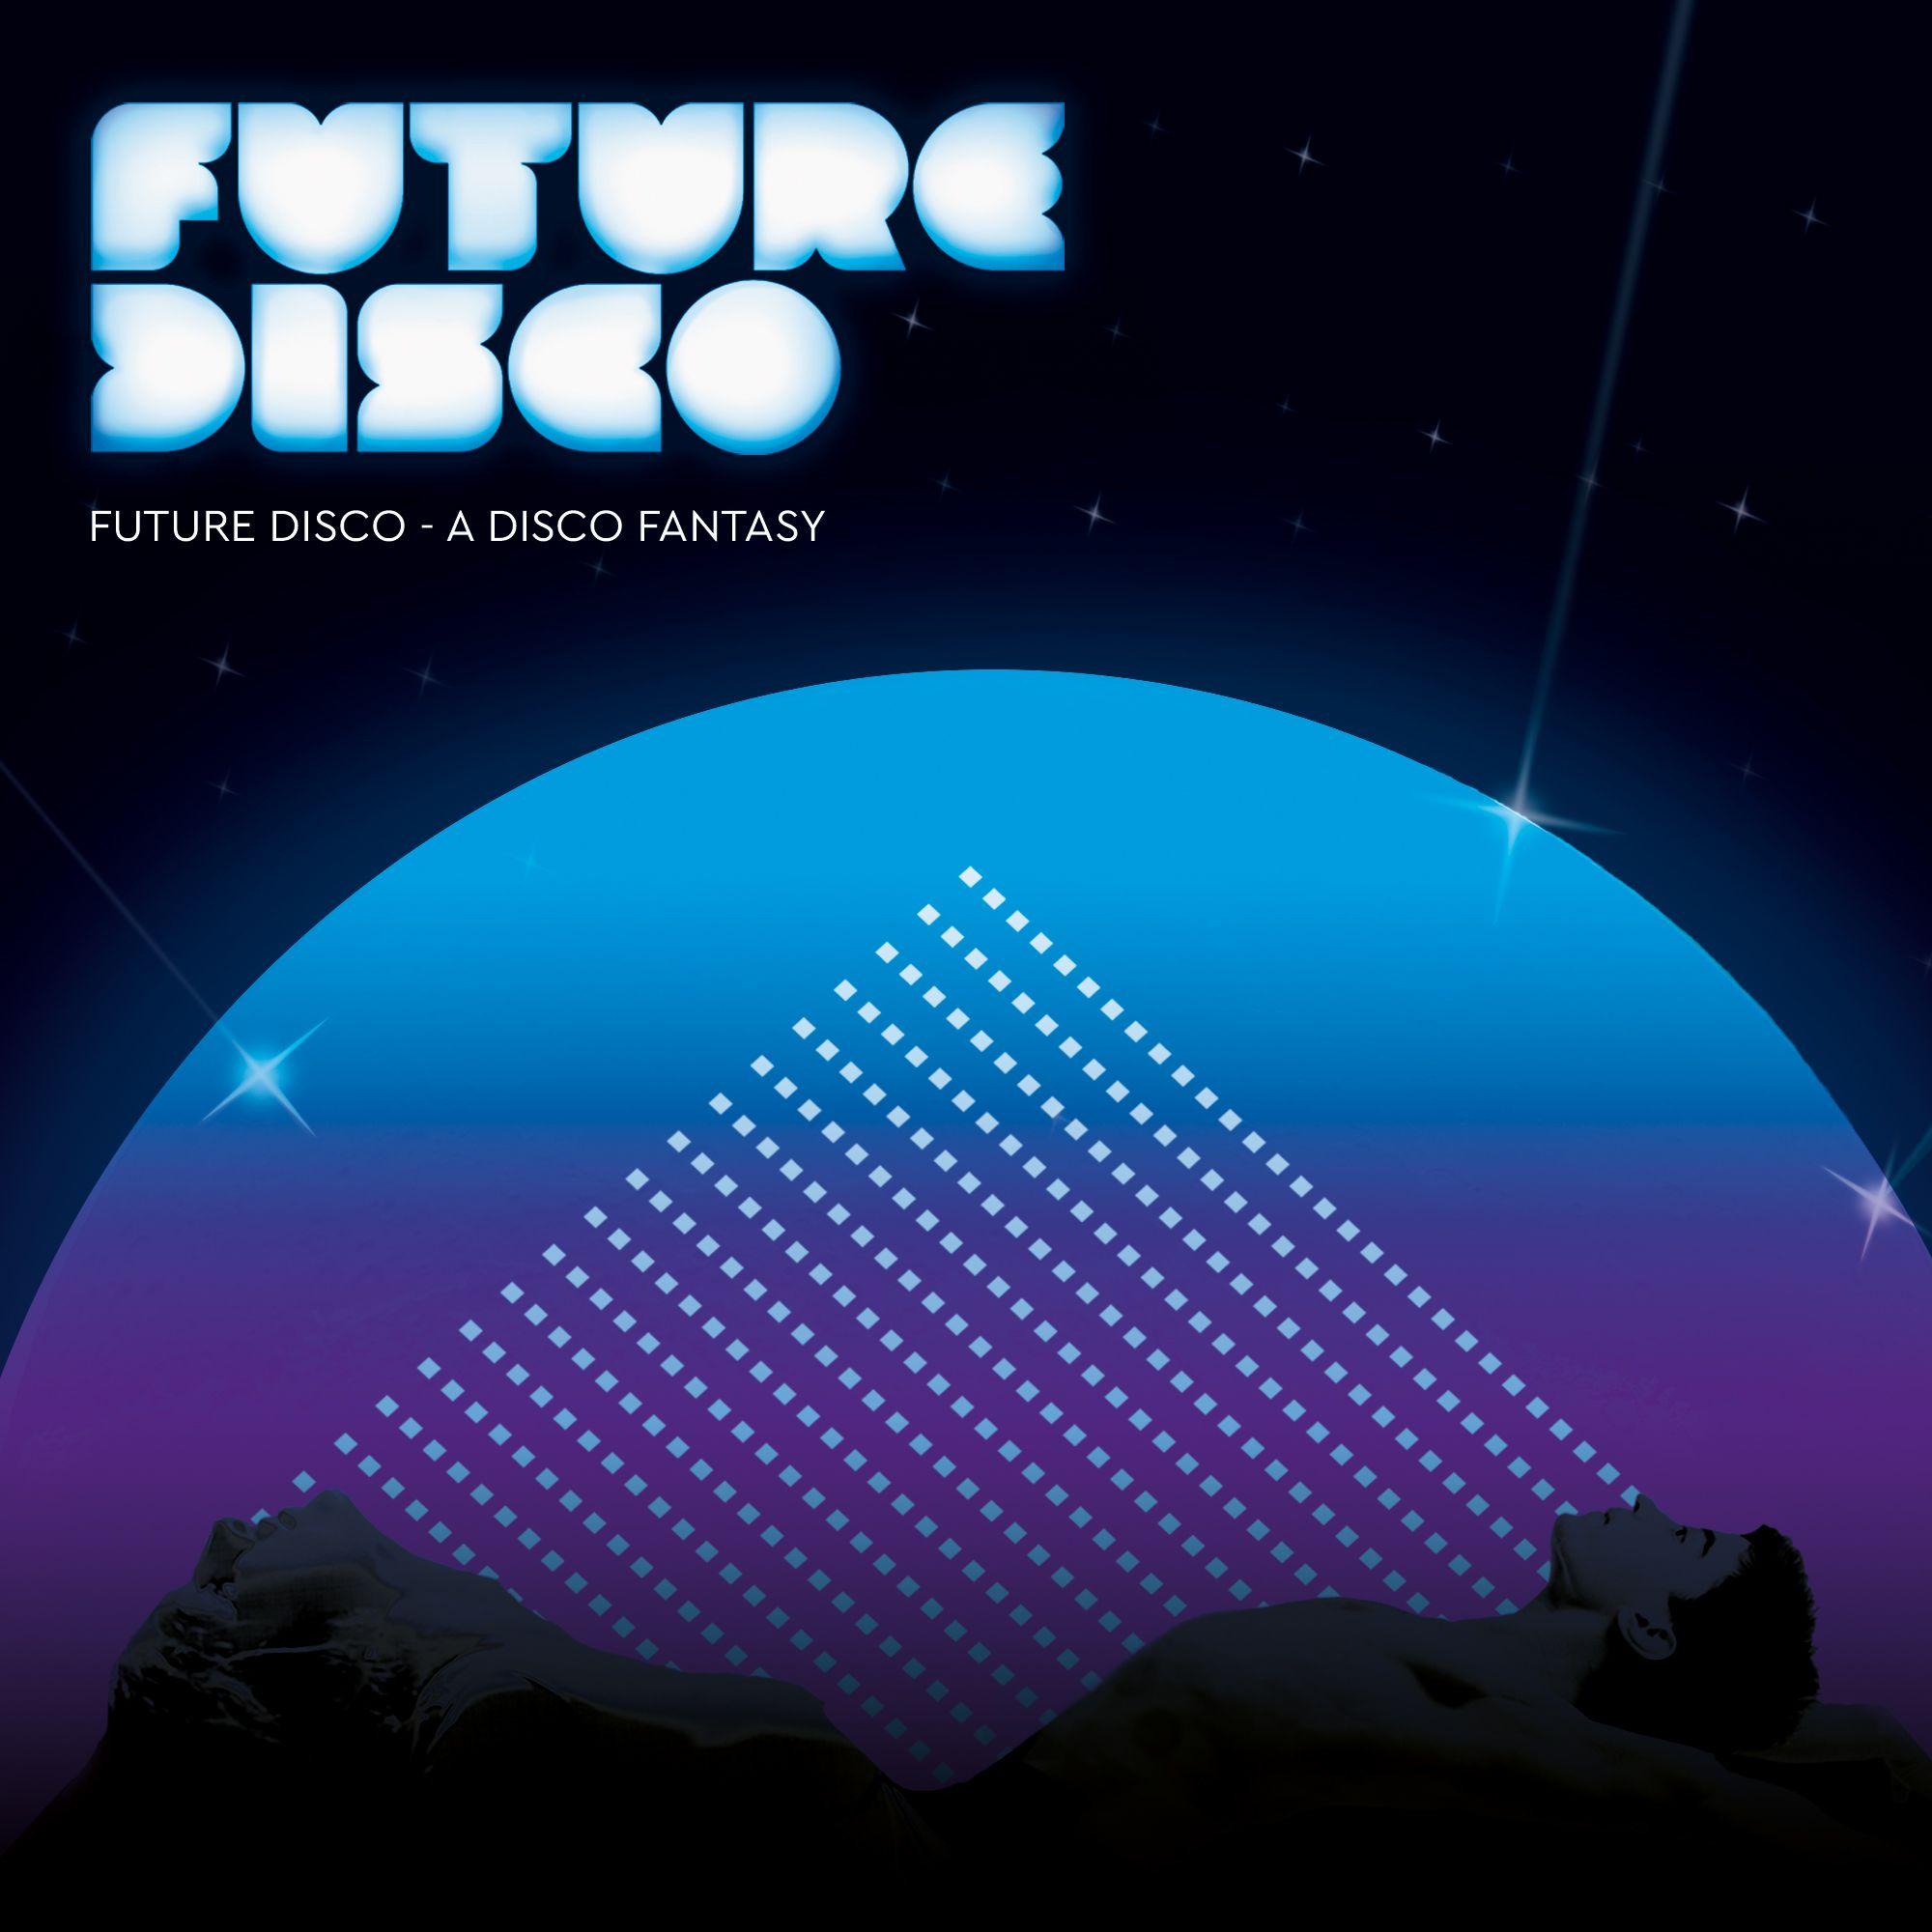 fd_disco_fantasy_digi.jpg